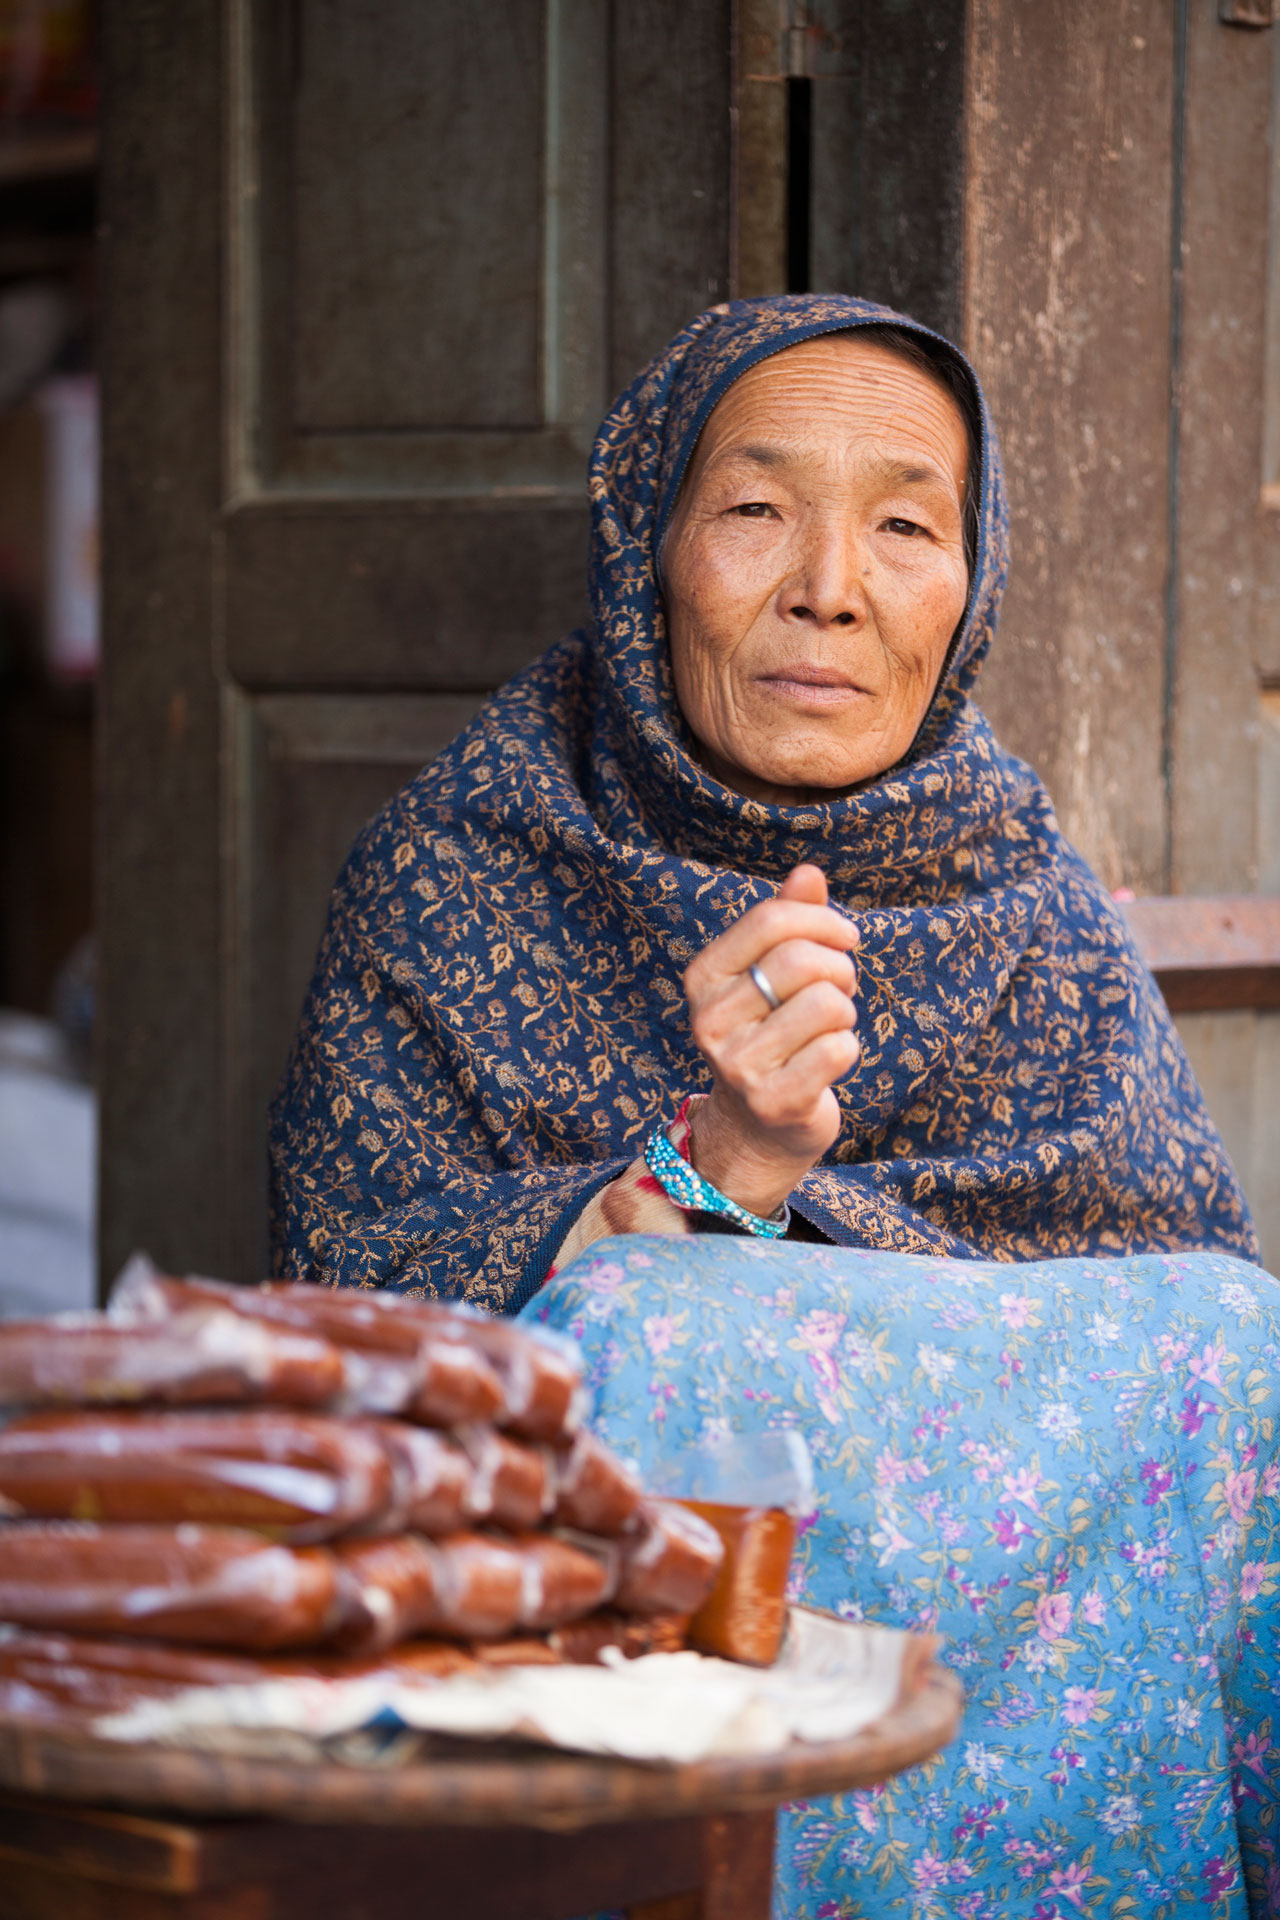 mujer-vendedora-dulces-nepal-katmandu.jpg